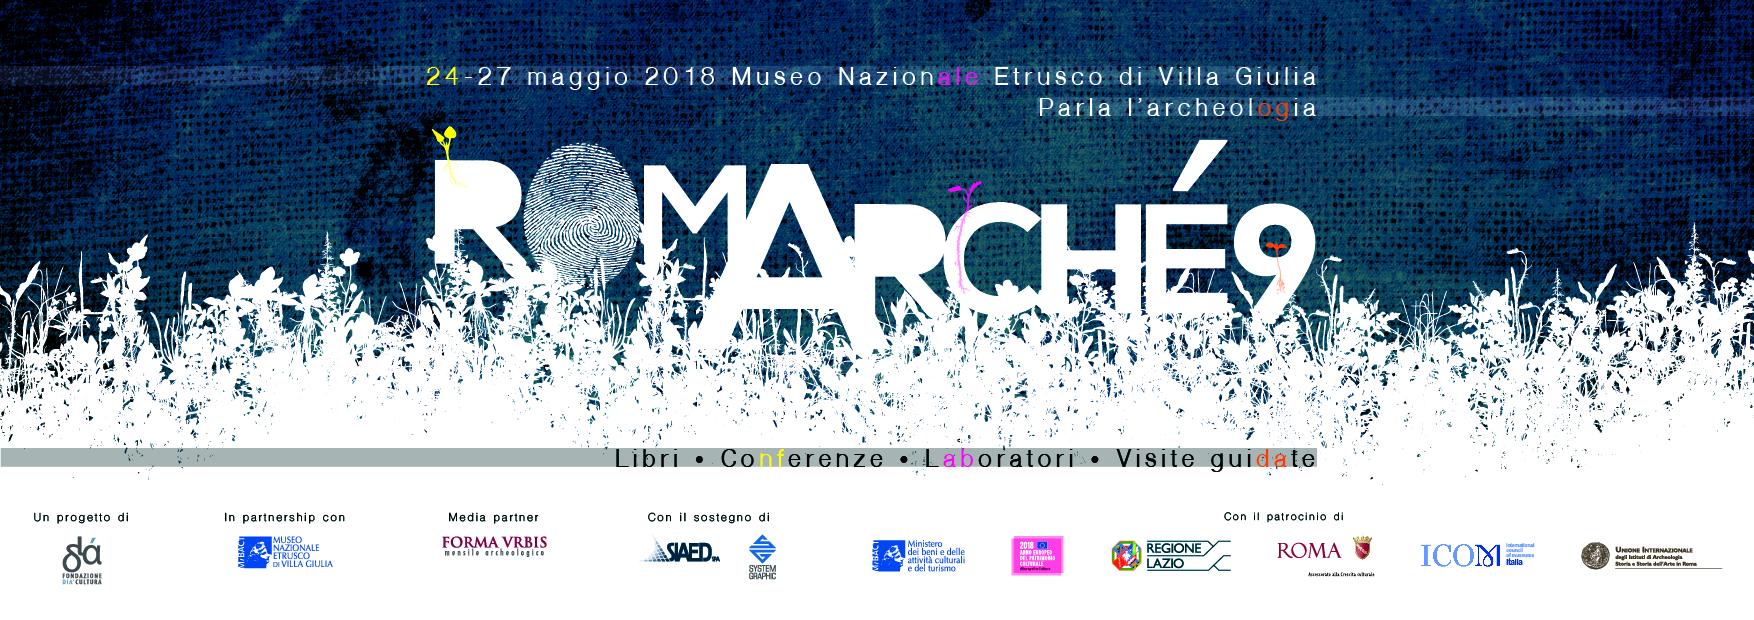 Banner RomArché 2018.jpg